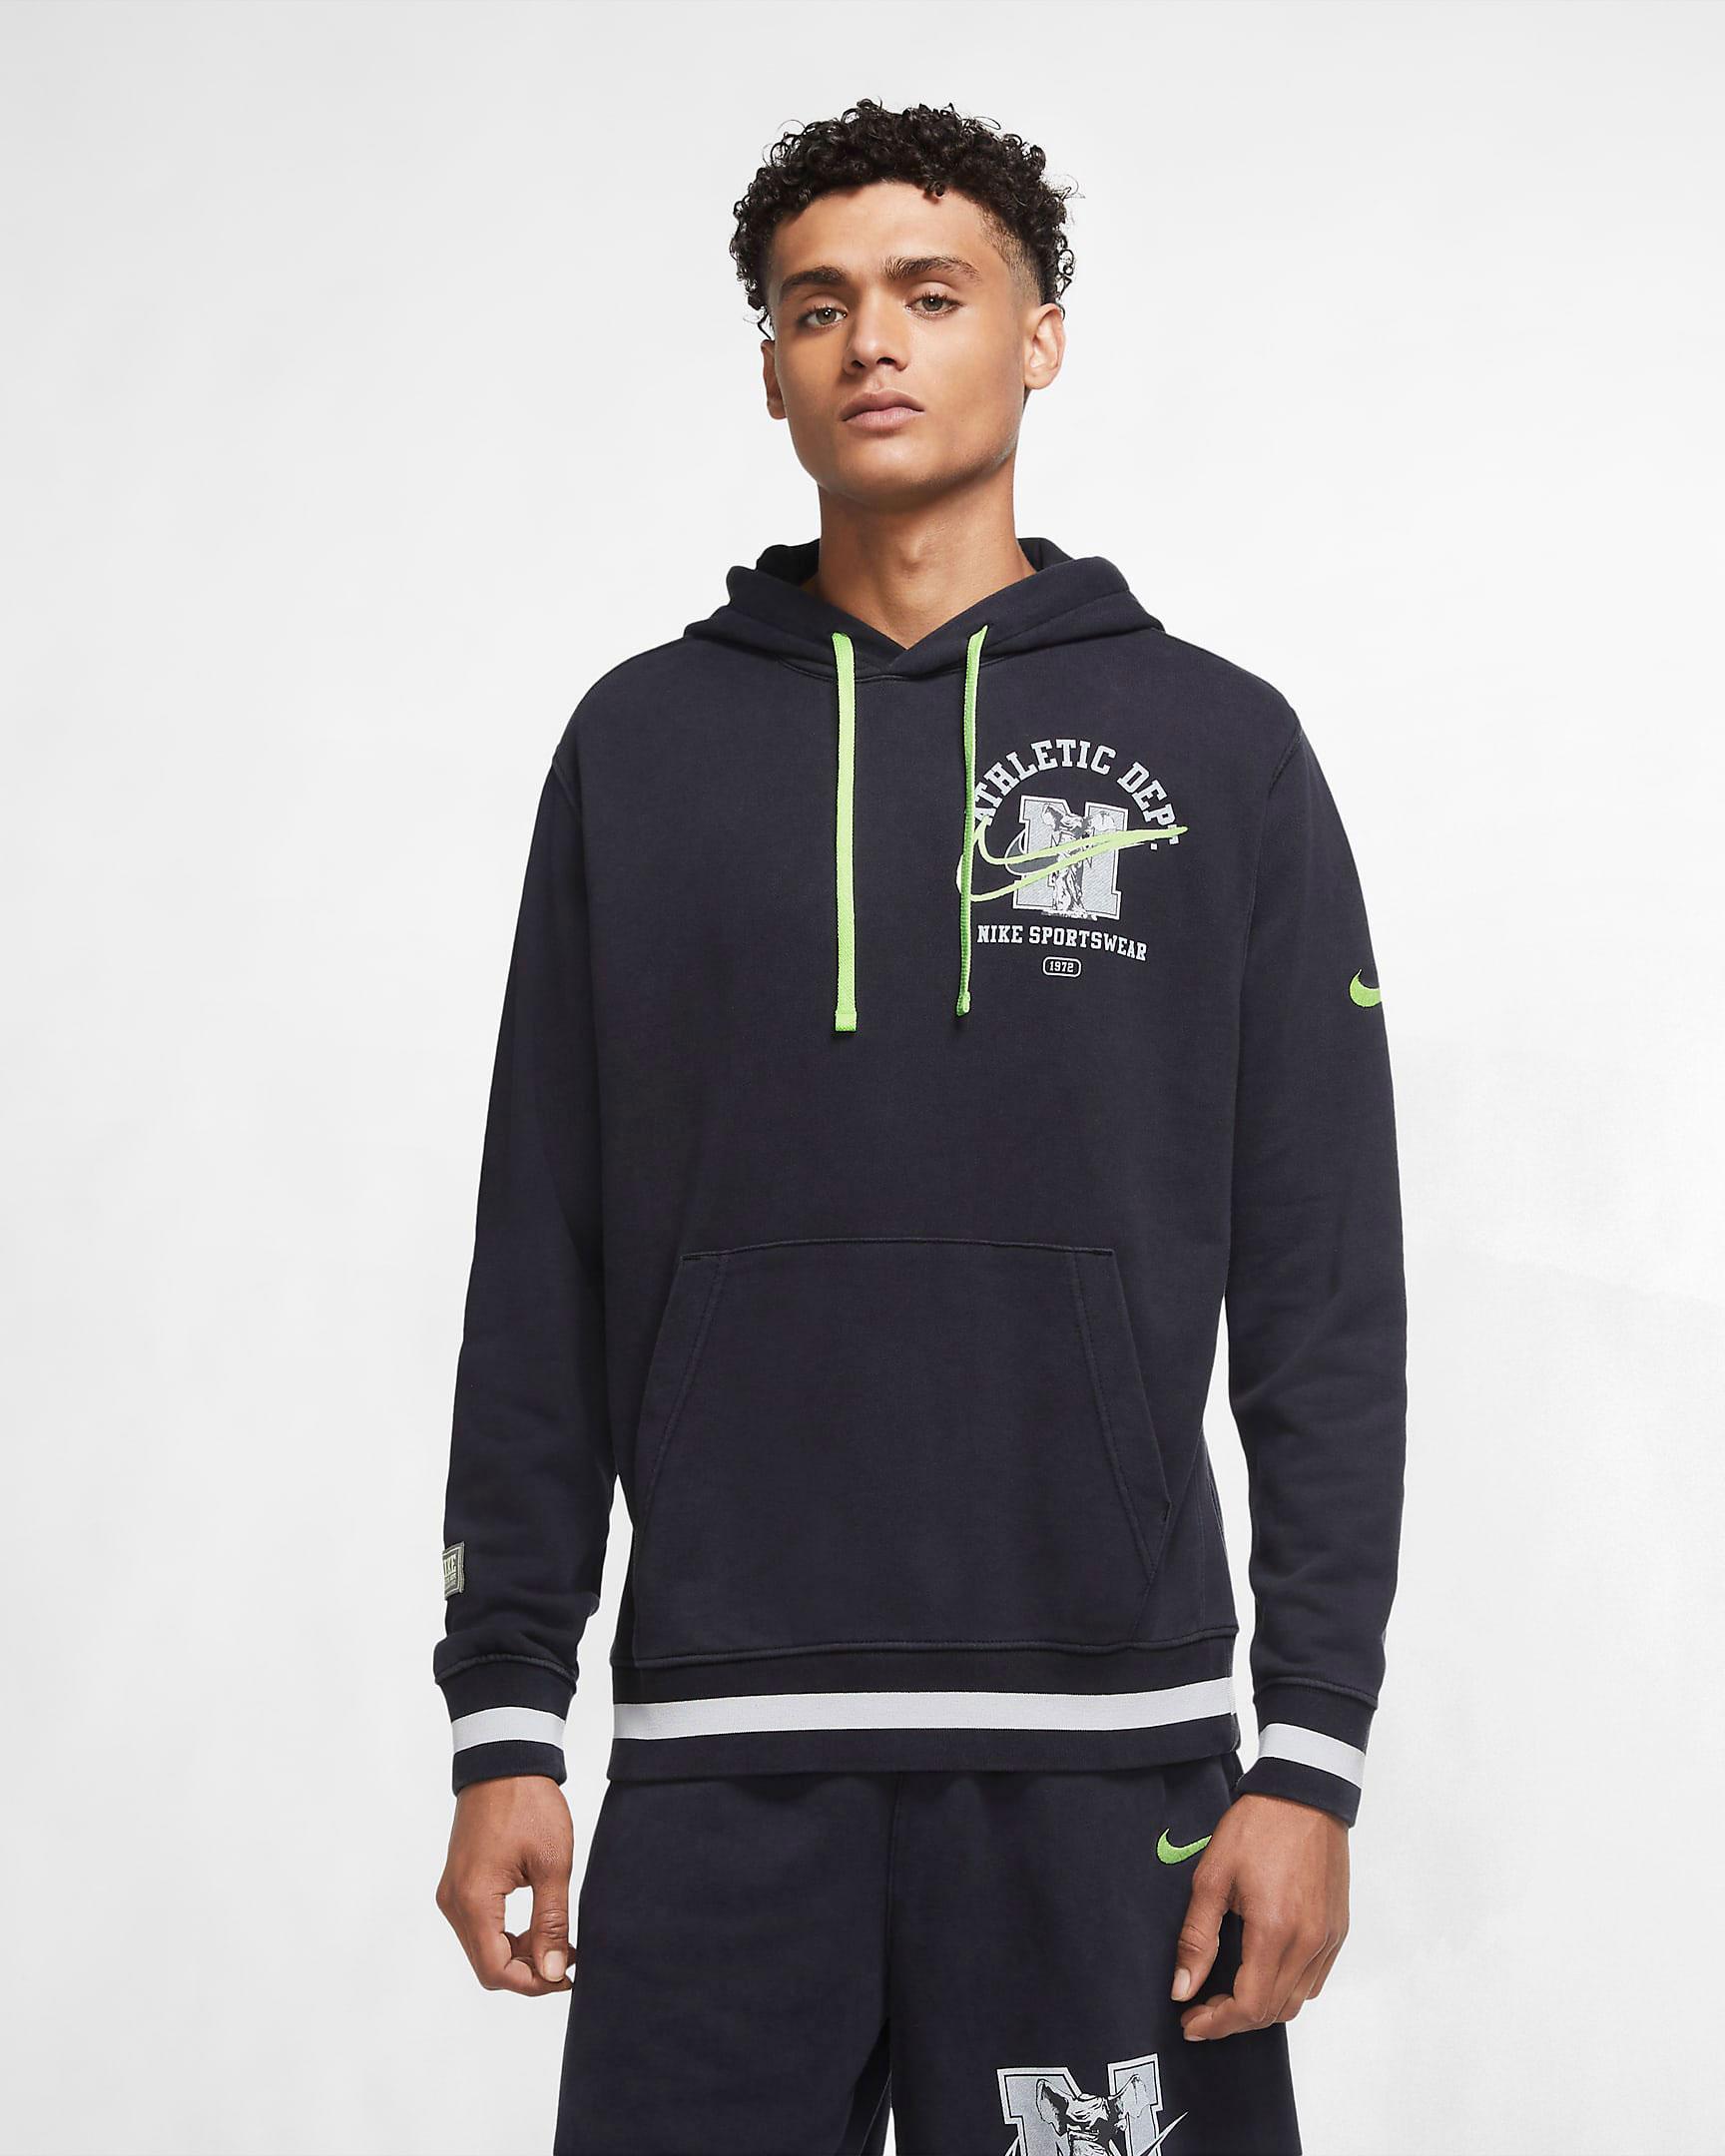 nike-club-fleece-hoodie-class-of-72-black-volt-1